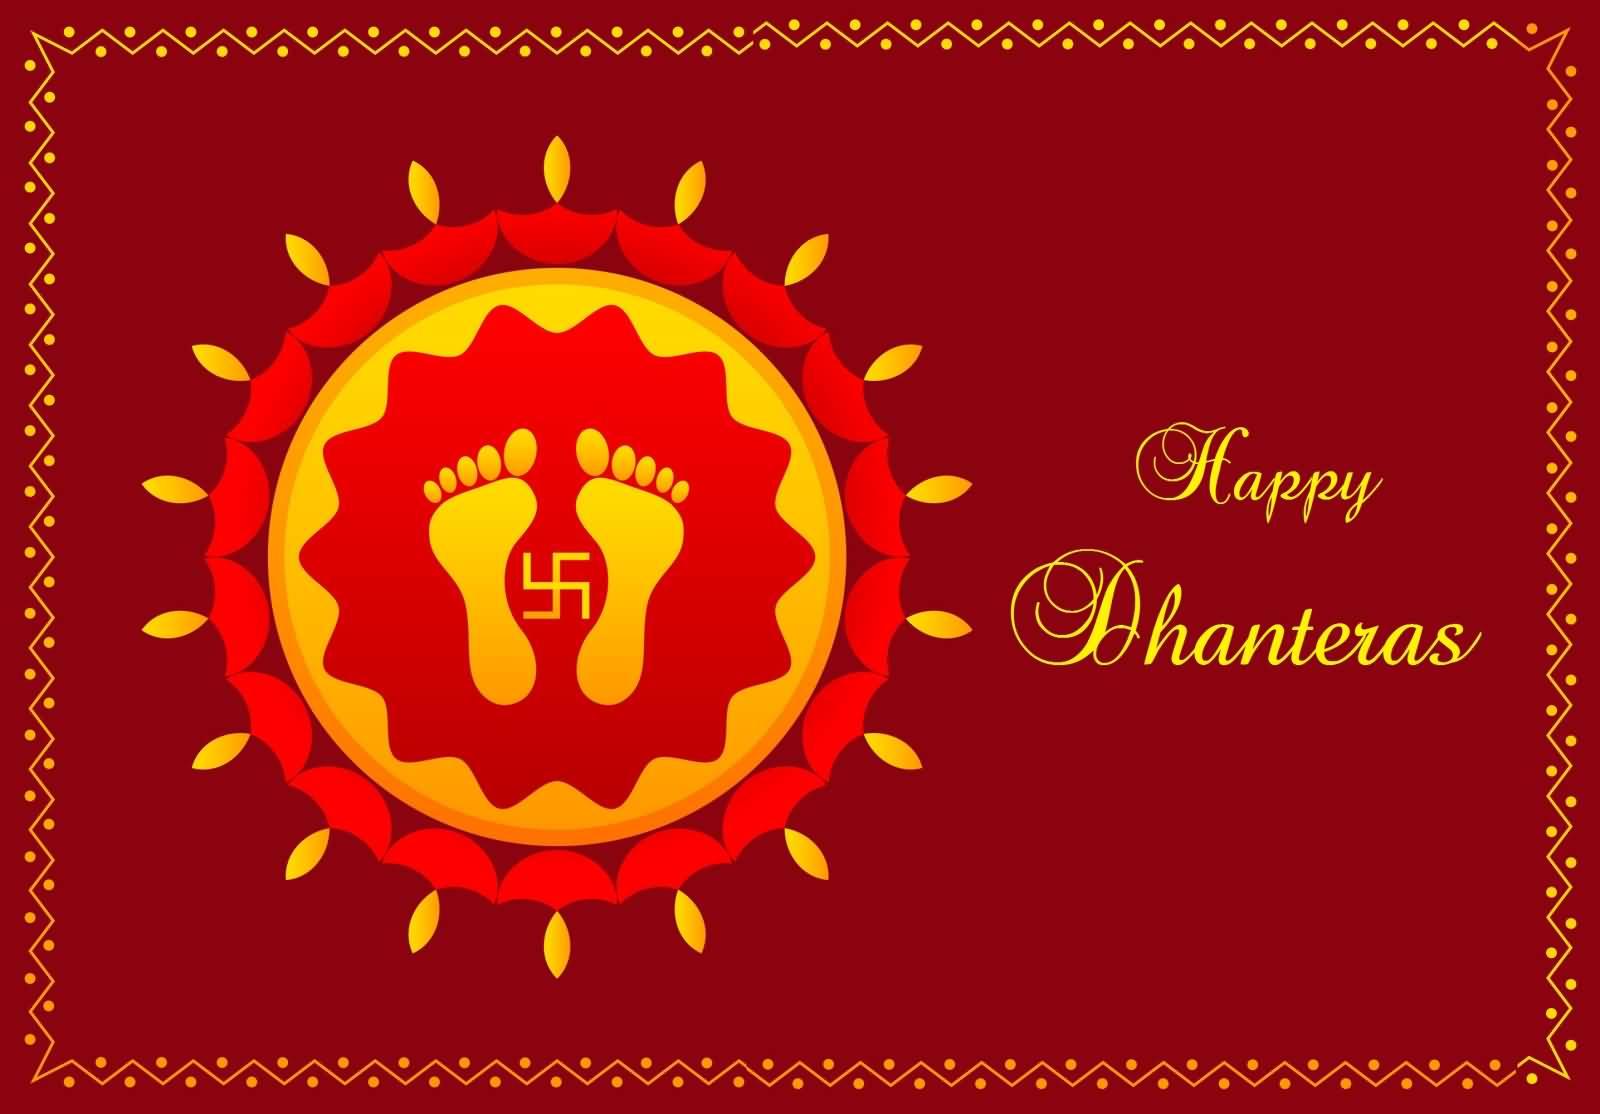 Mata Ke Wallpaper Hd 40 Happy Dhanteras 2016 Greeting Card Pictures And Images